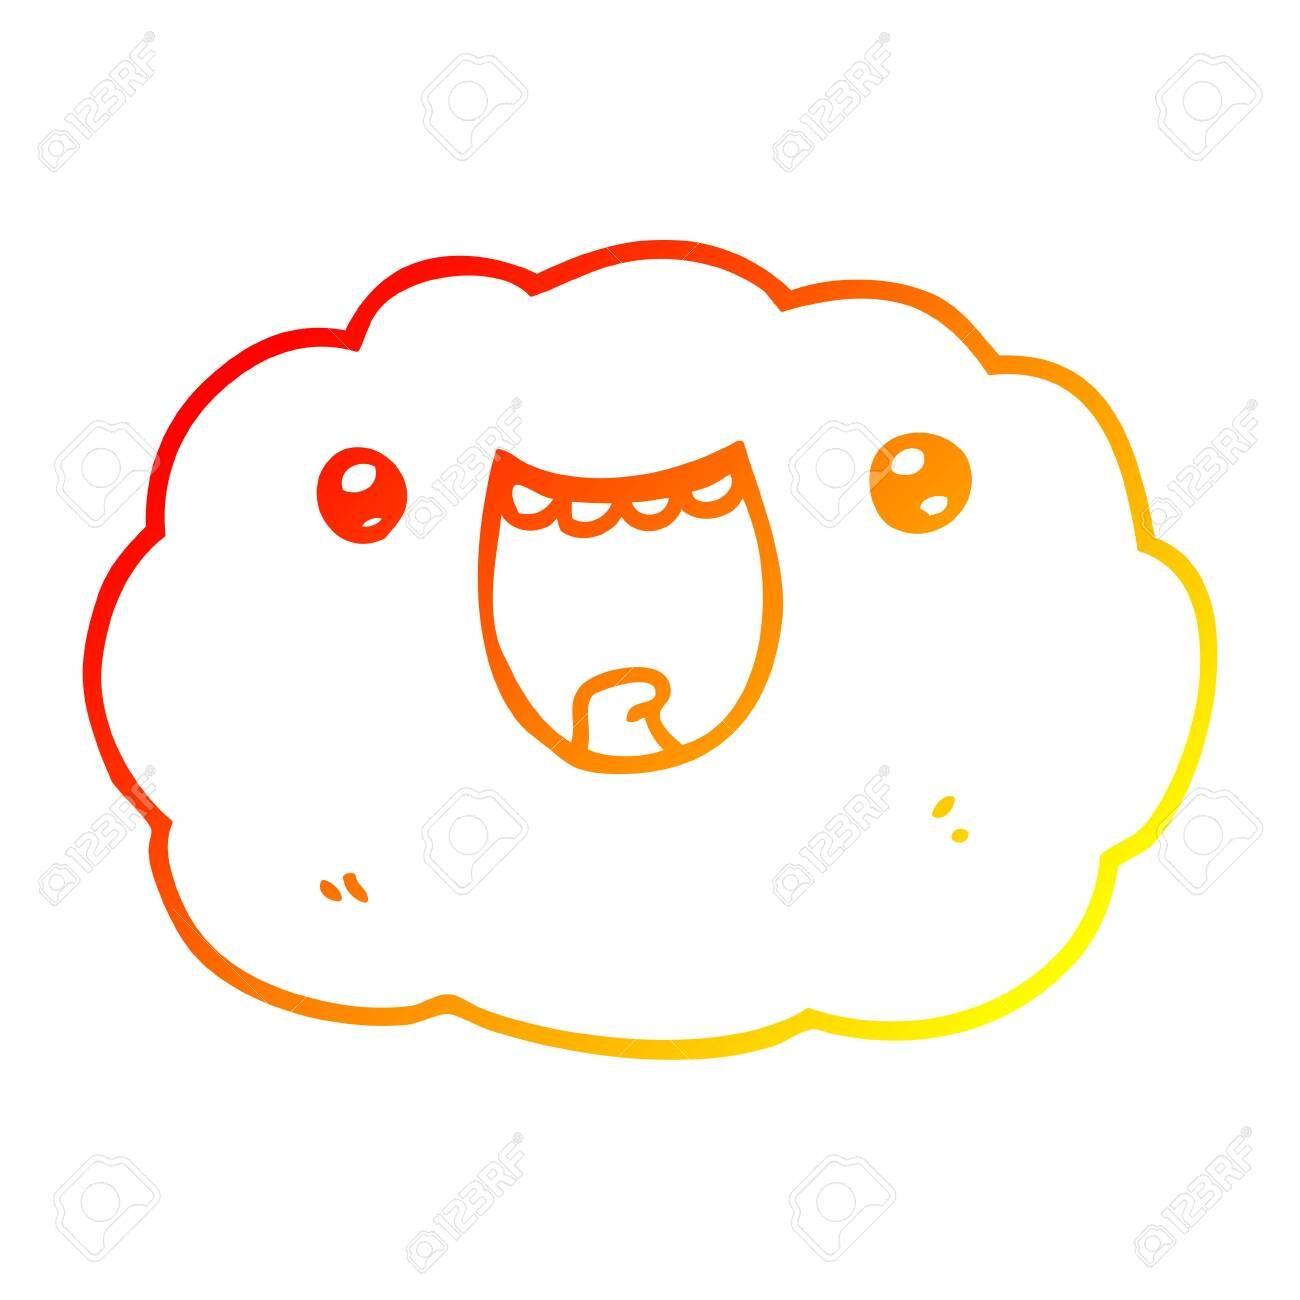 warm gradient line drawing of a cartoon happy cloud ,